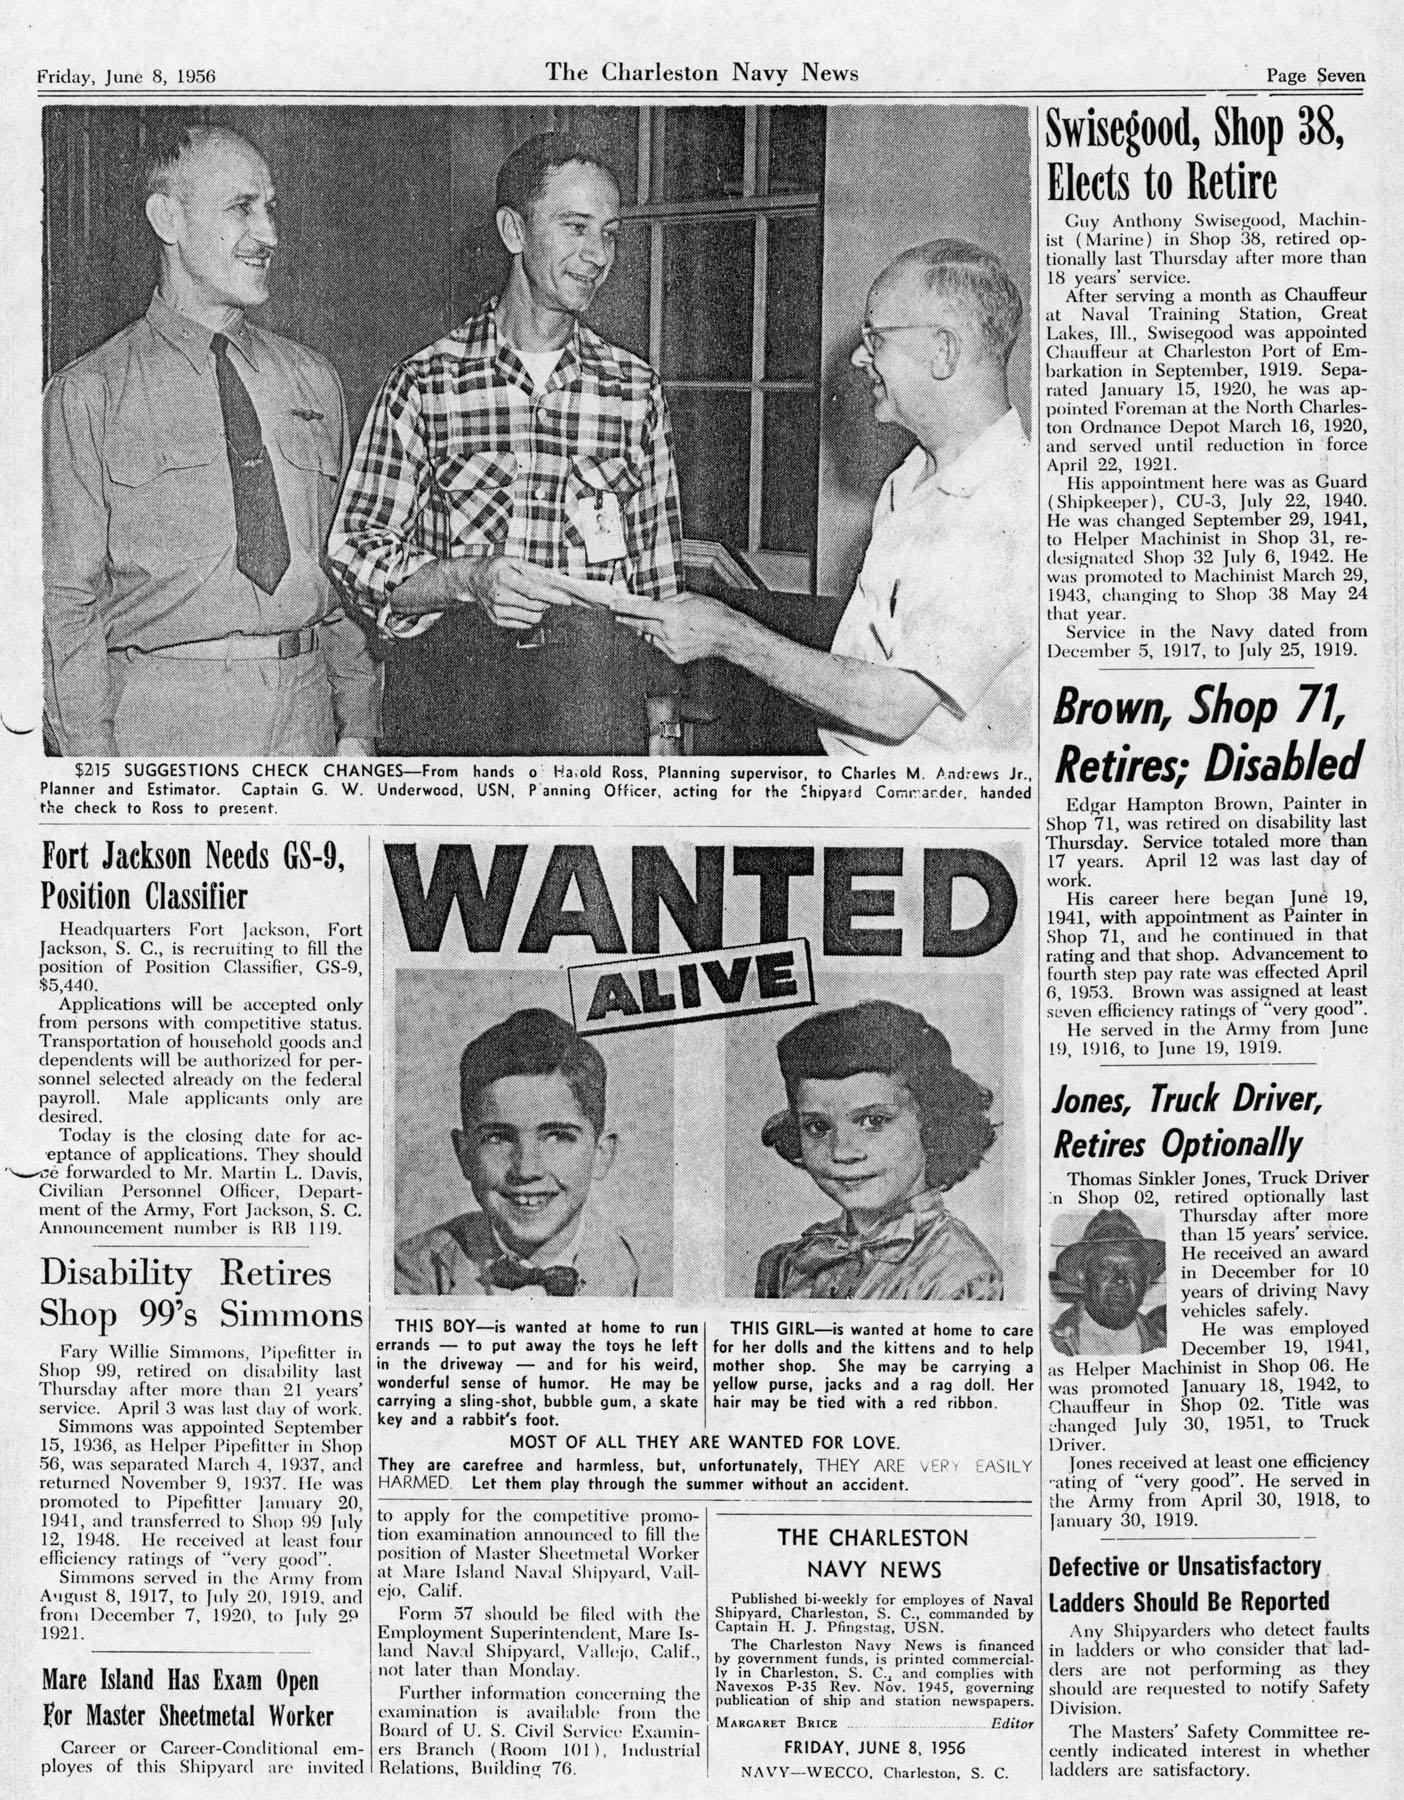 The Charleston Navy News, Volume 14, Edition 23, page vii